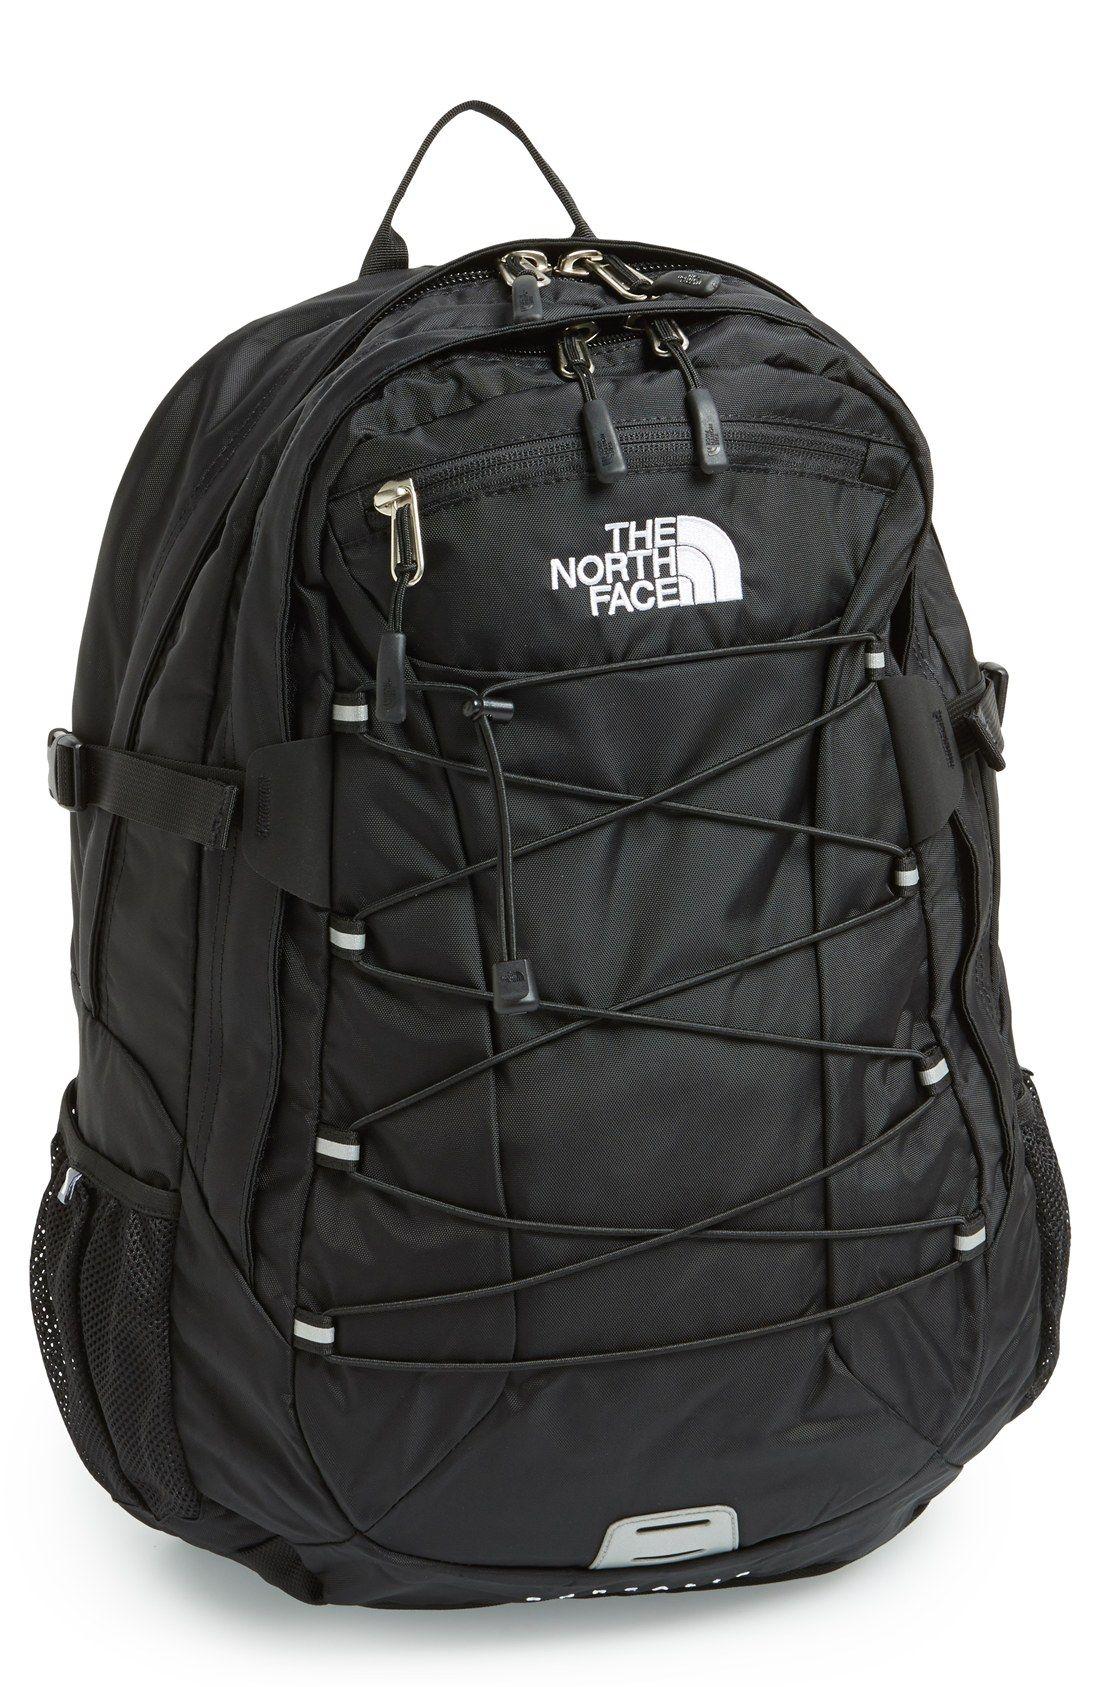 6871c4874cdb The North Face  Borealis  Backpack